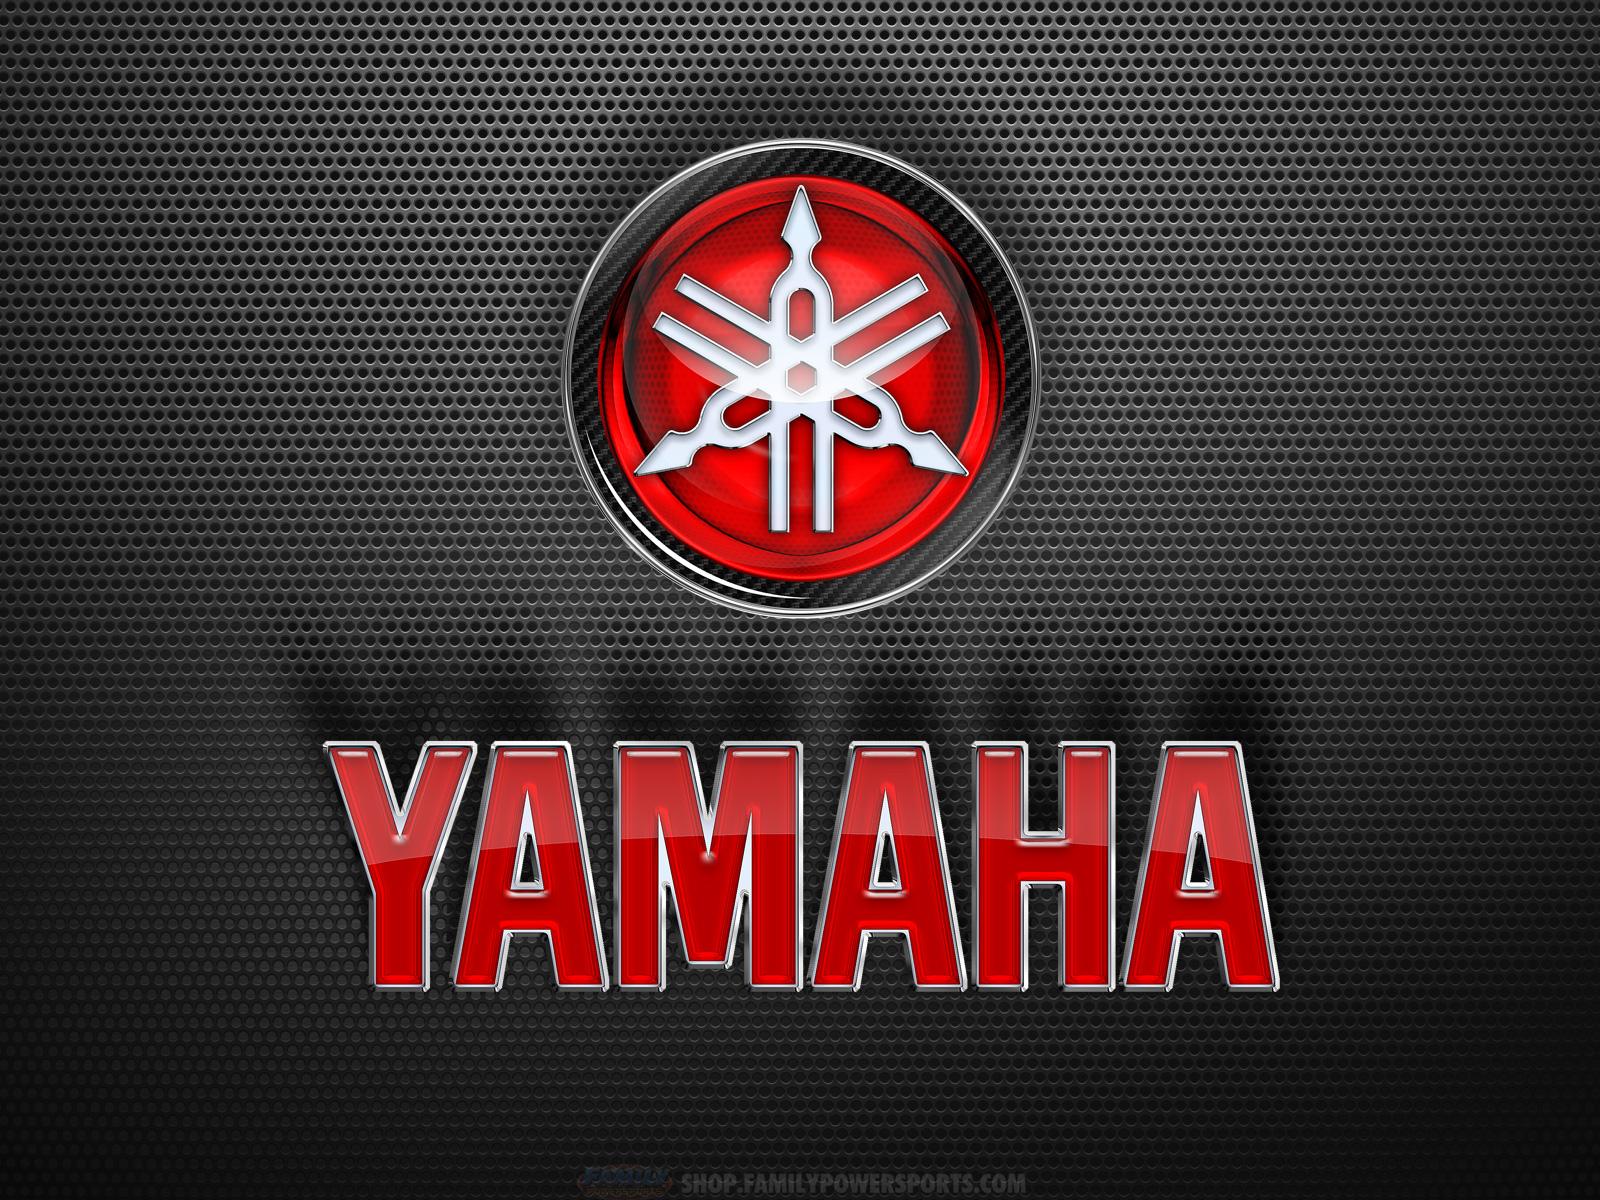 yamaha logo wallpaper wallpapersafari yamaha logo style guide yamaha logistics manager